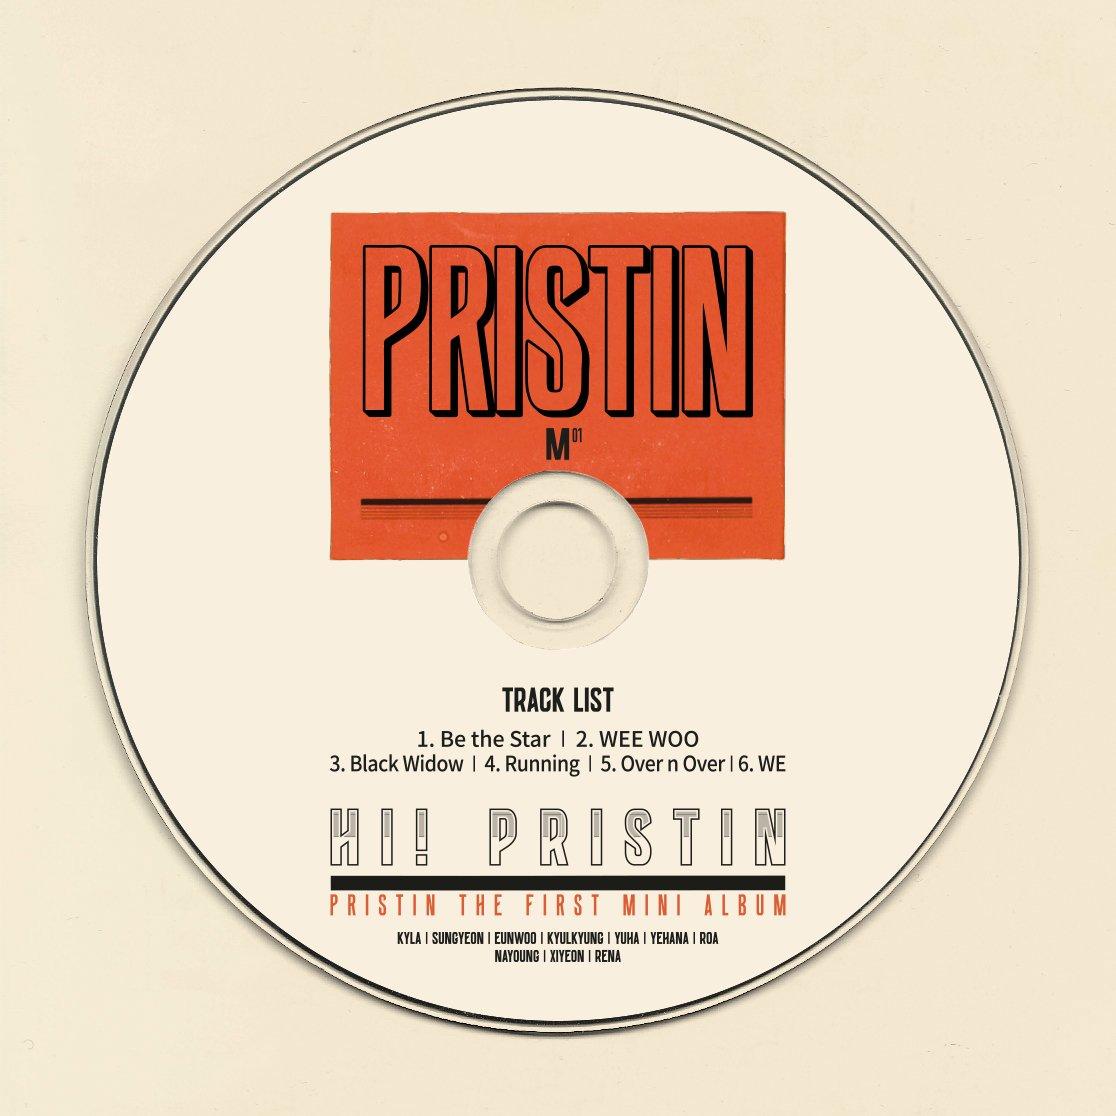 pristin track list